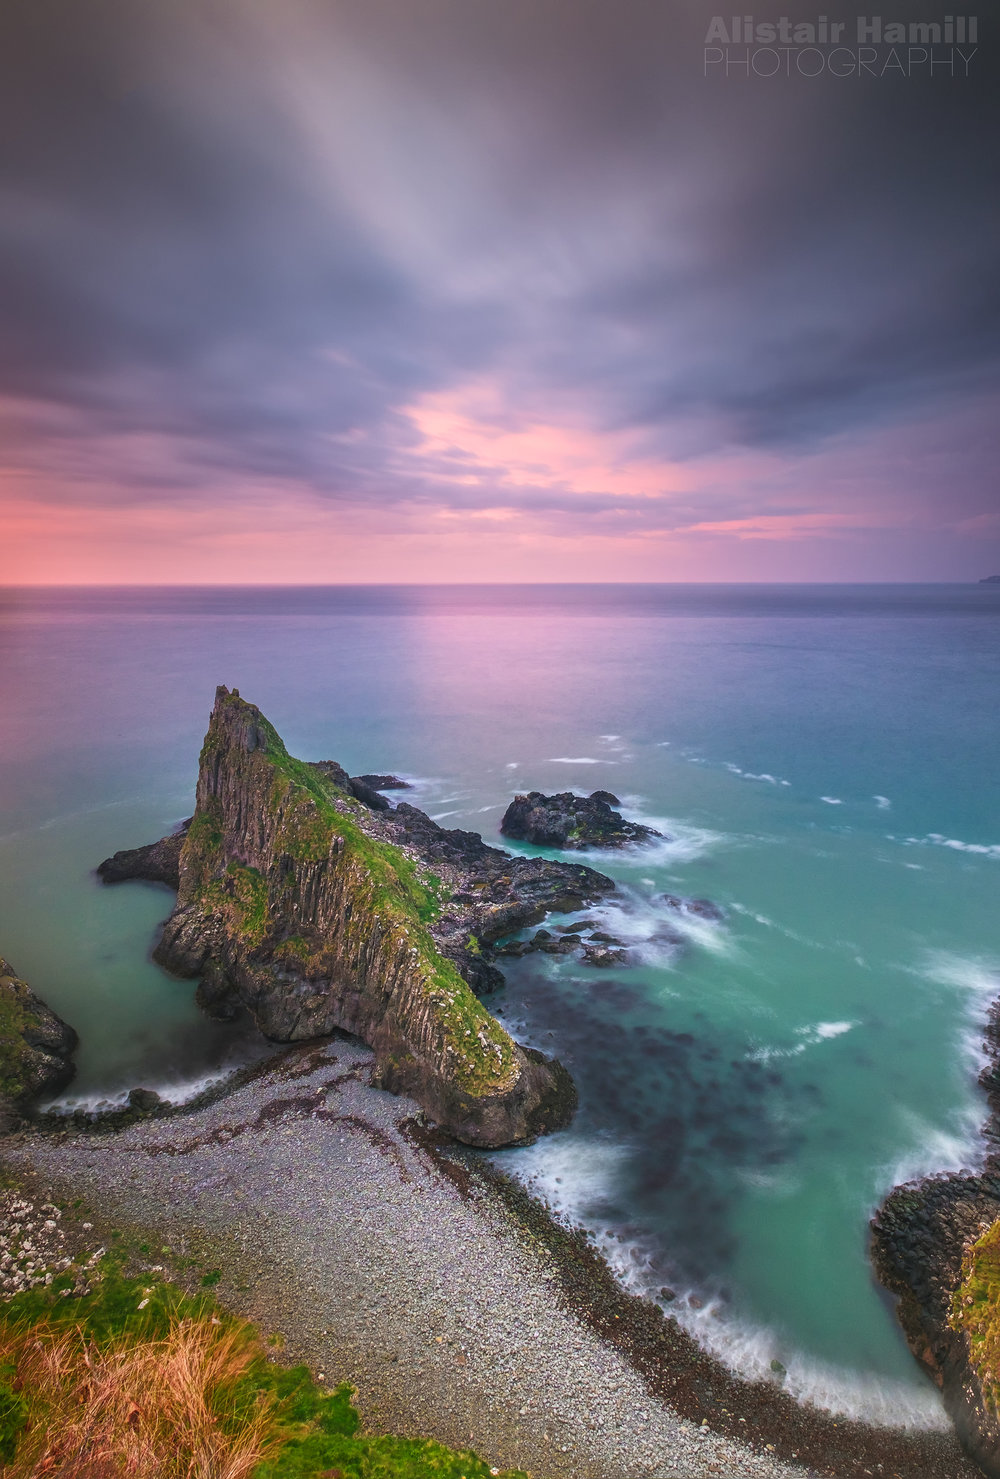 Wee island sunset 2 (large) WM.jpg